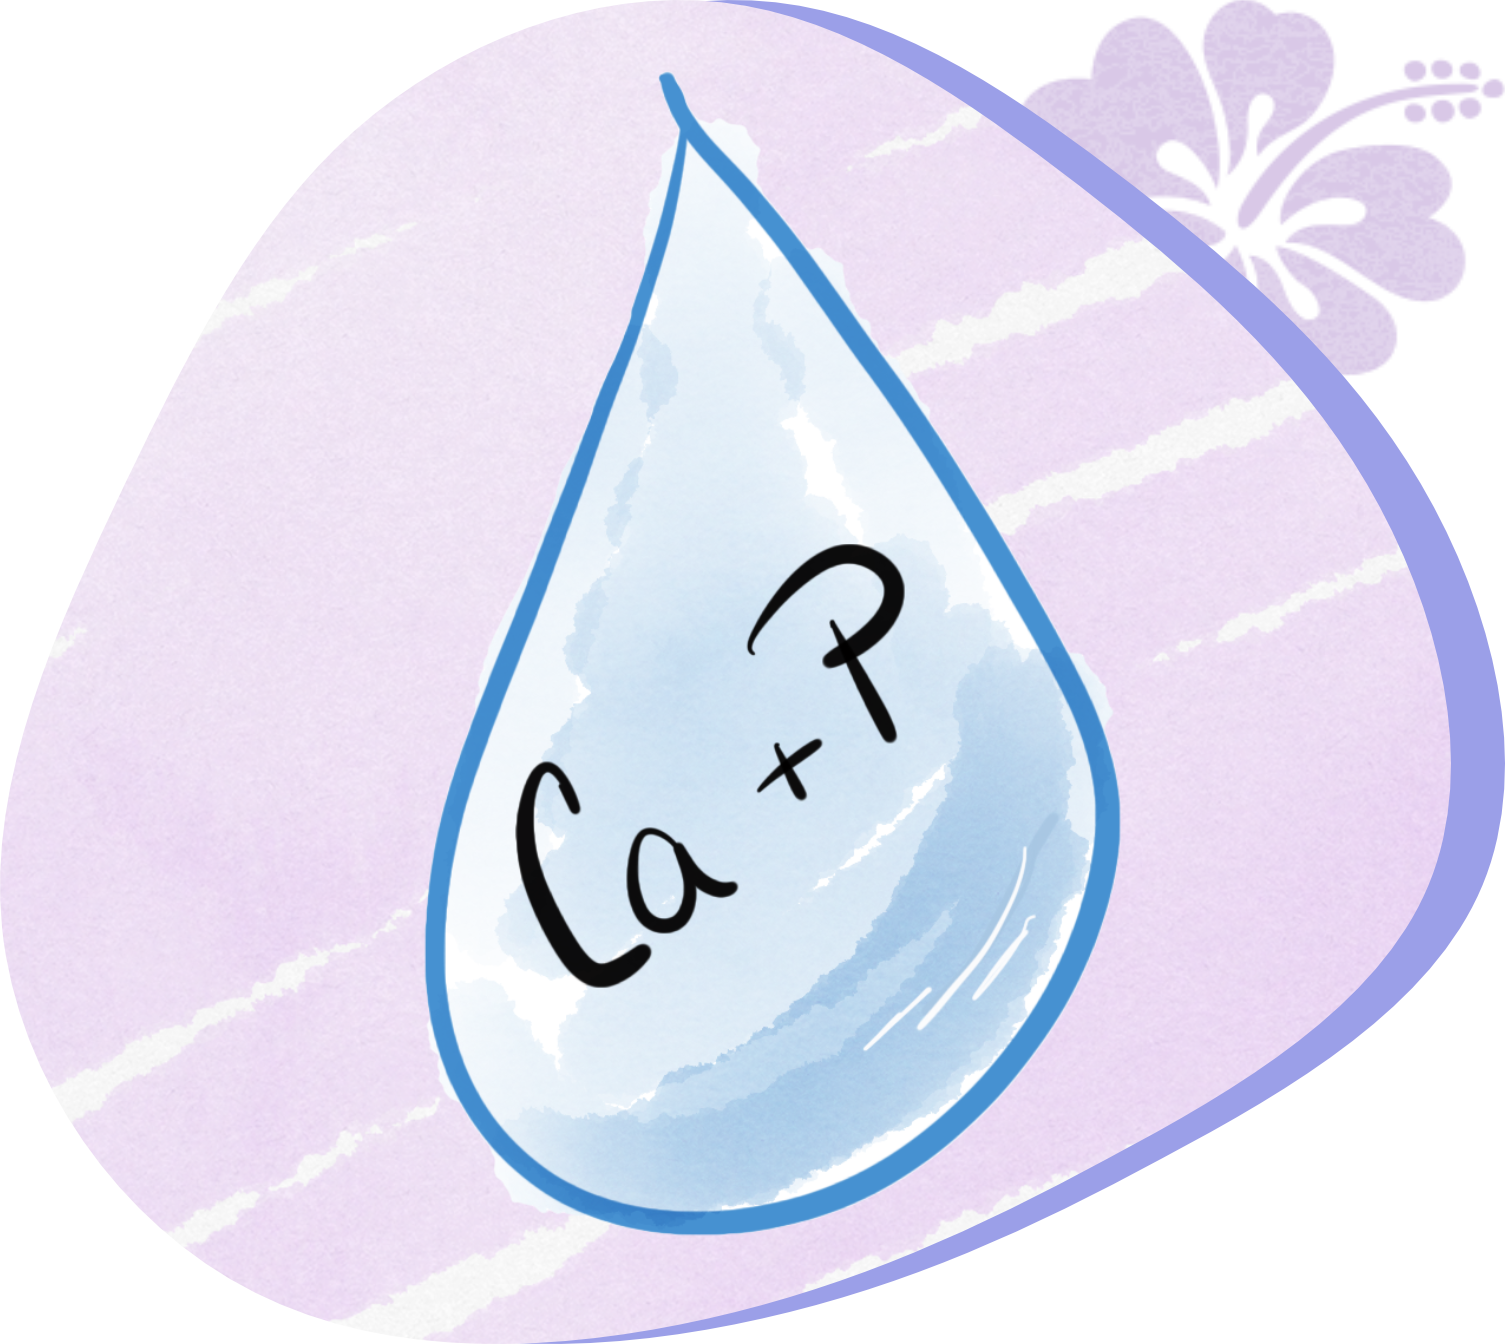 Saliva drop with Ca + P